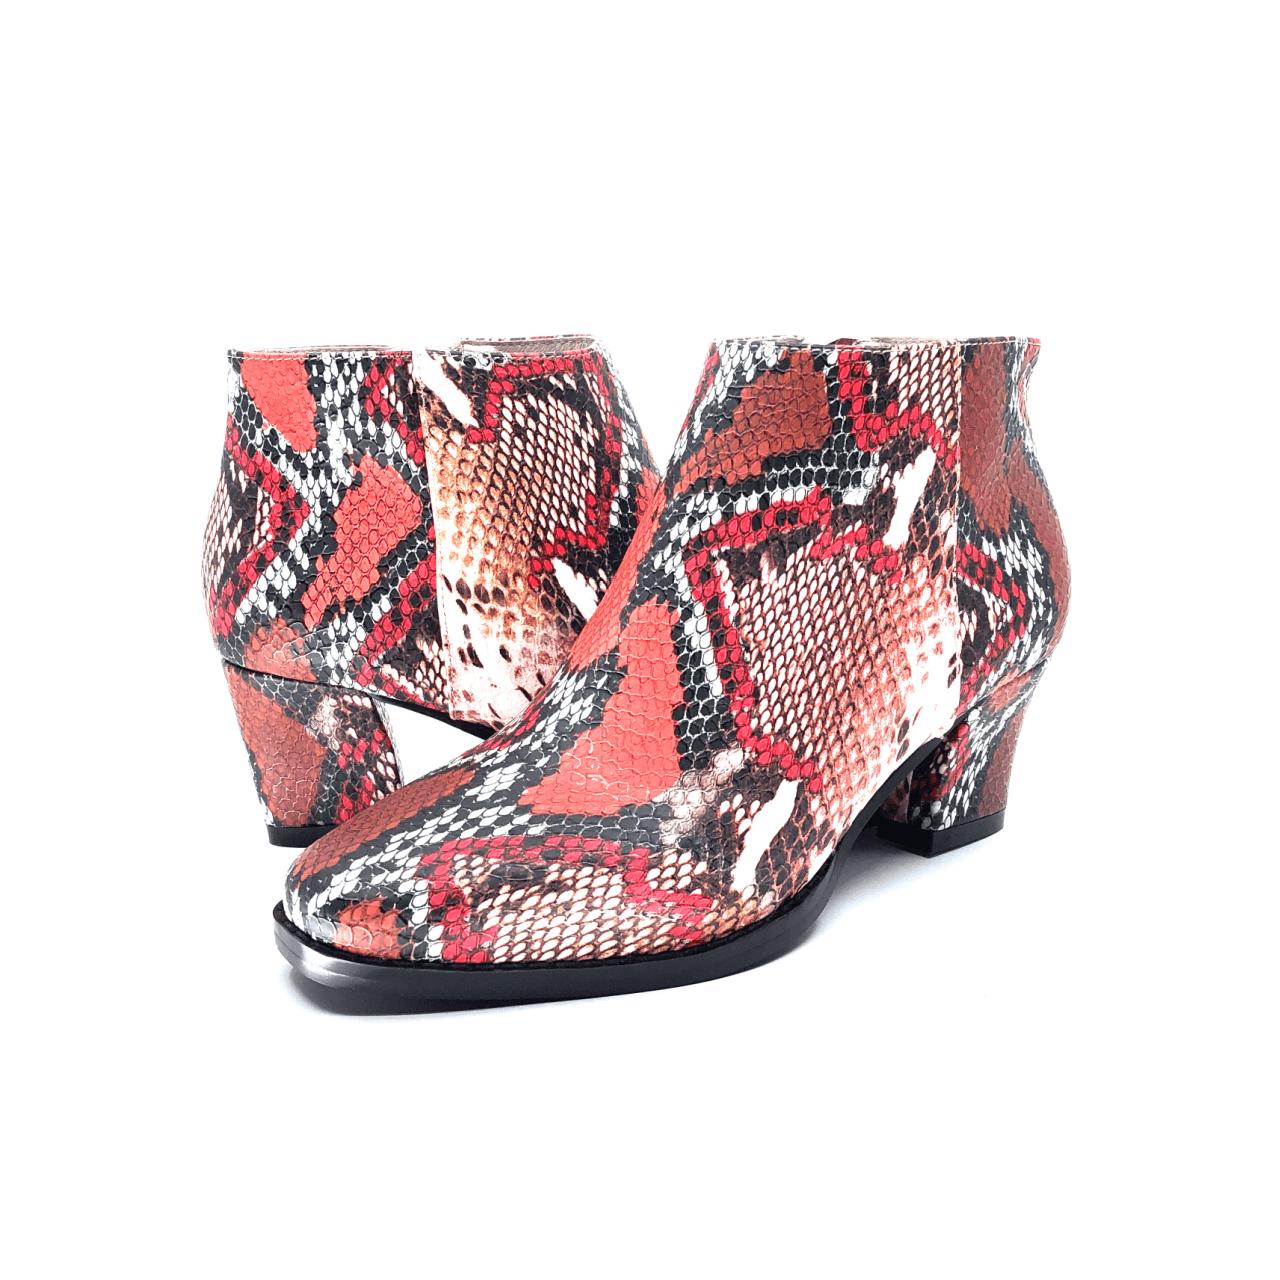 Pink Python Low Heel Boot I Iris by Scarlettos